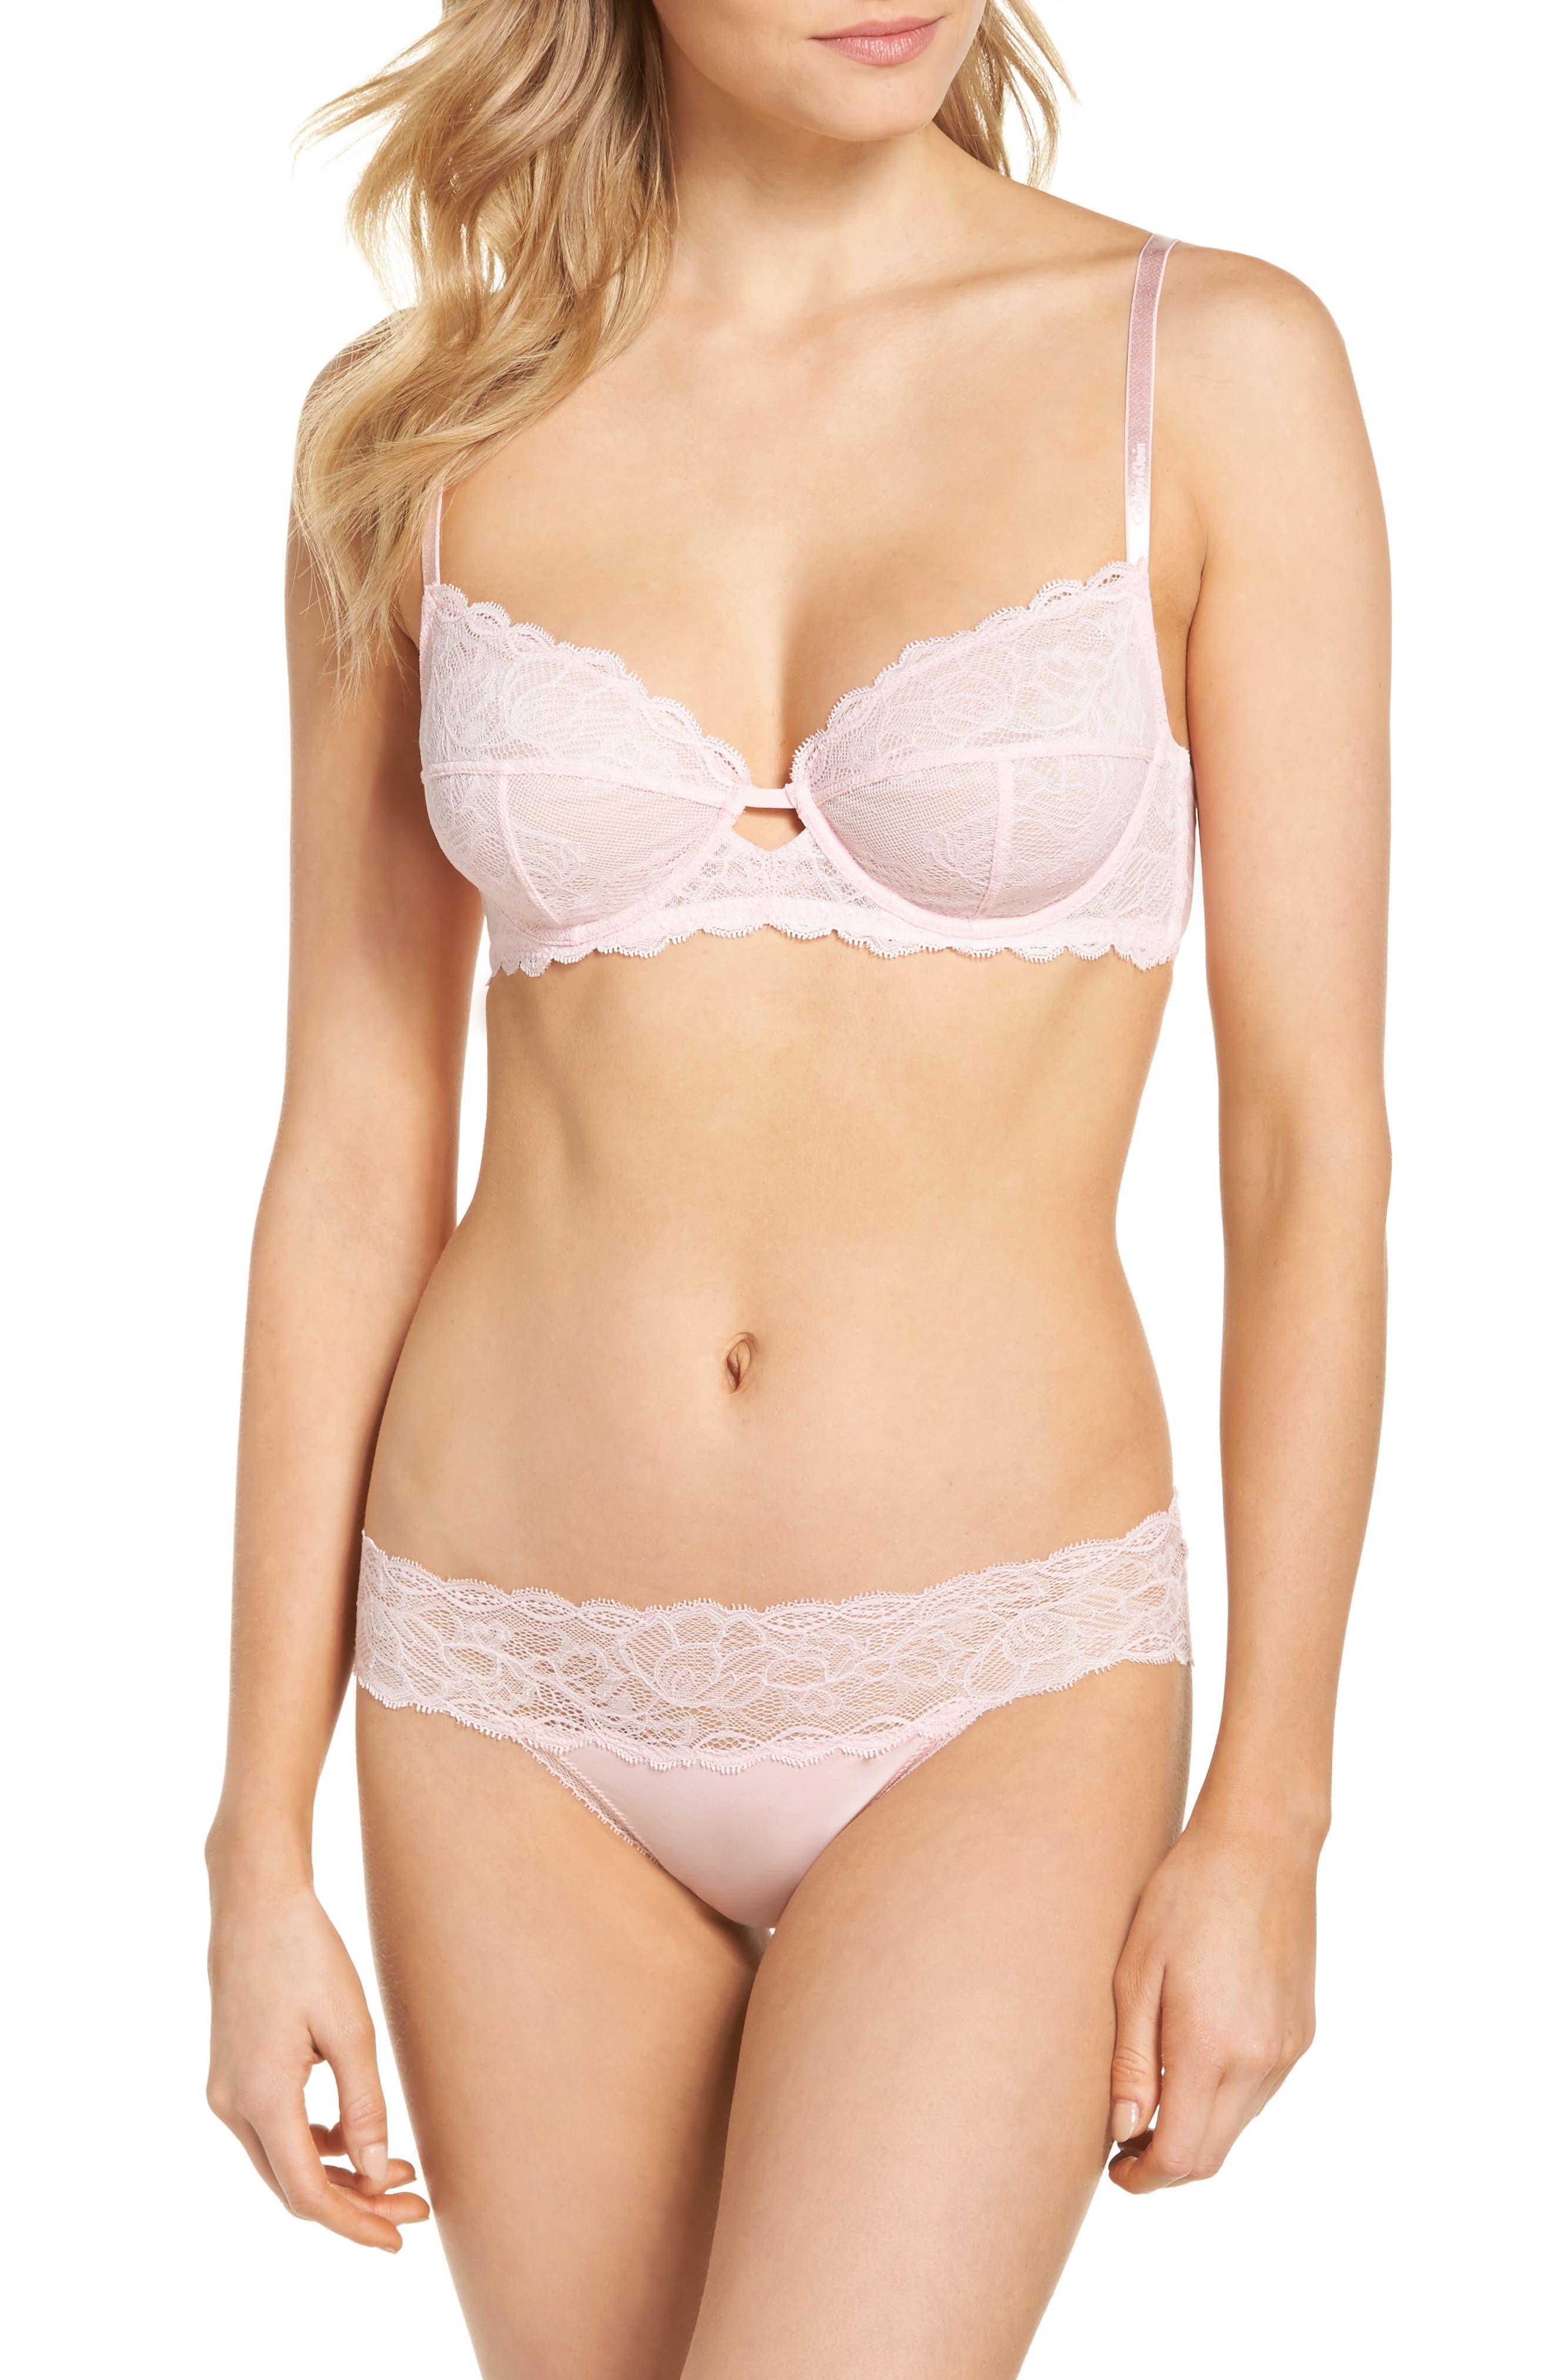 Seductive Comfort Lace Bikini,                             Alternate thumbnail 7, color,                             Attract